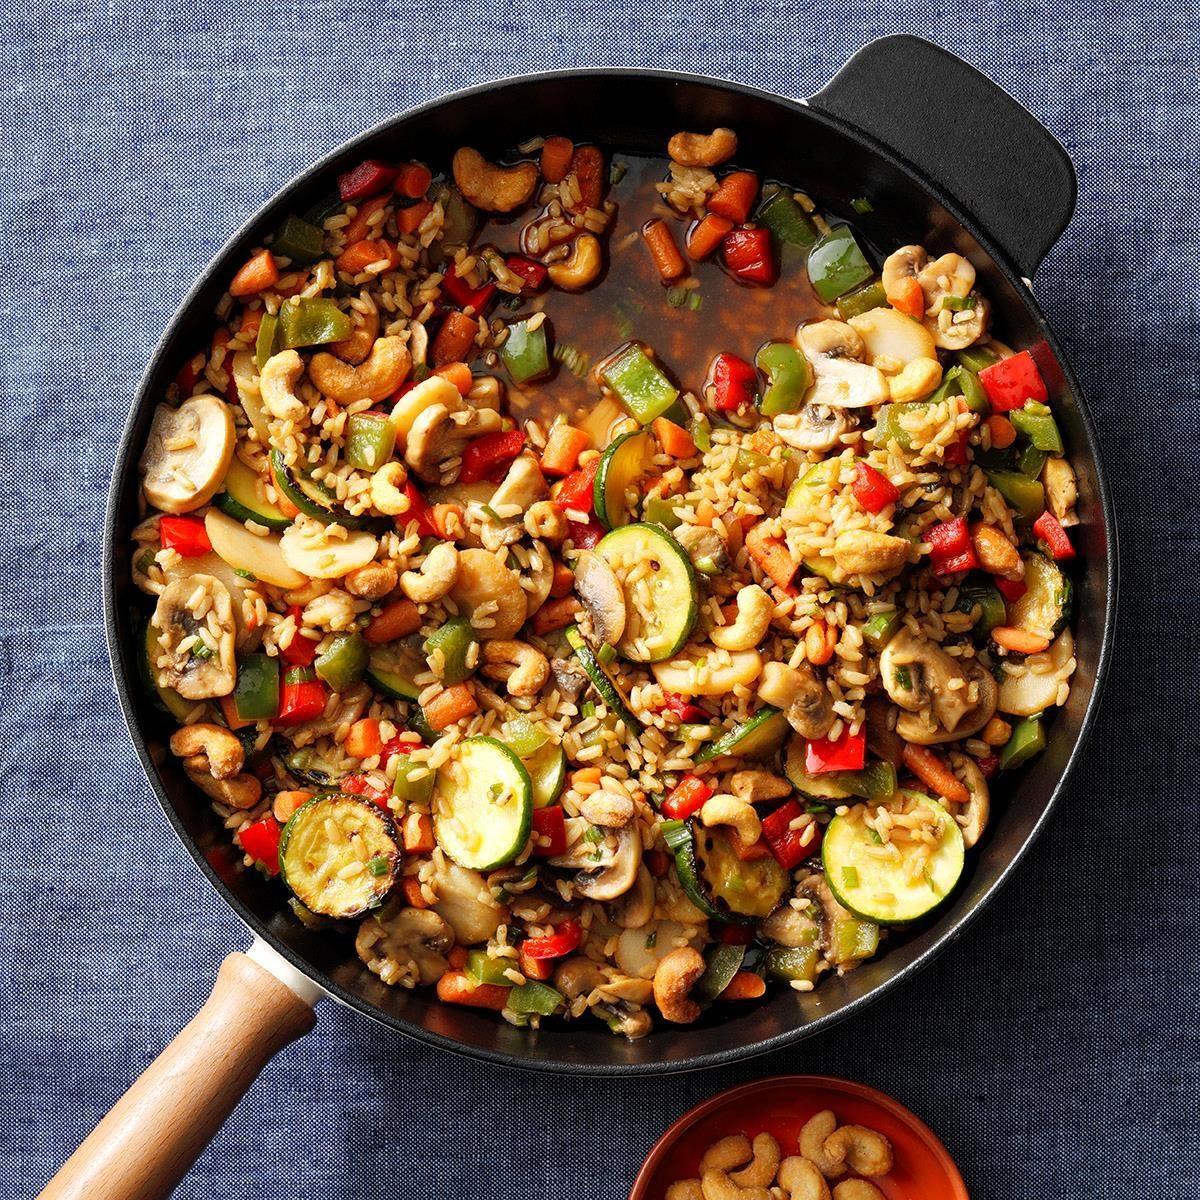 Vegan Veggie-Cashew Stir-Fry